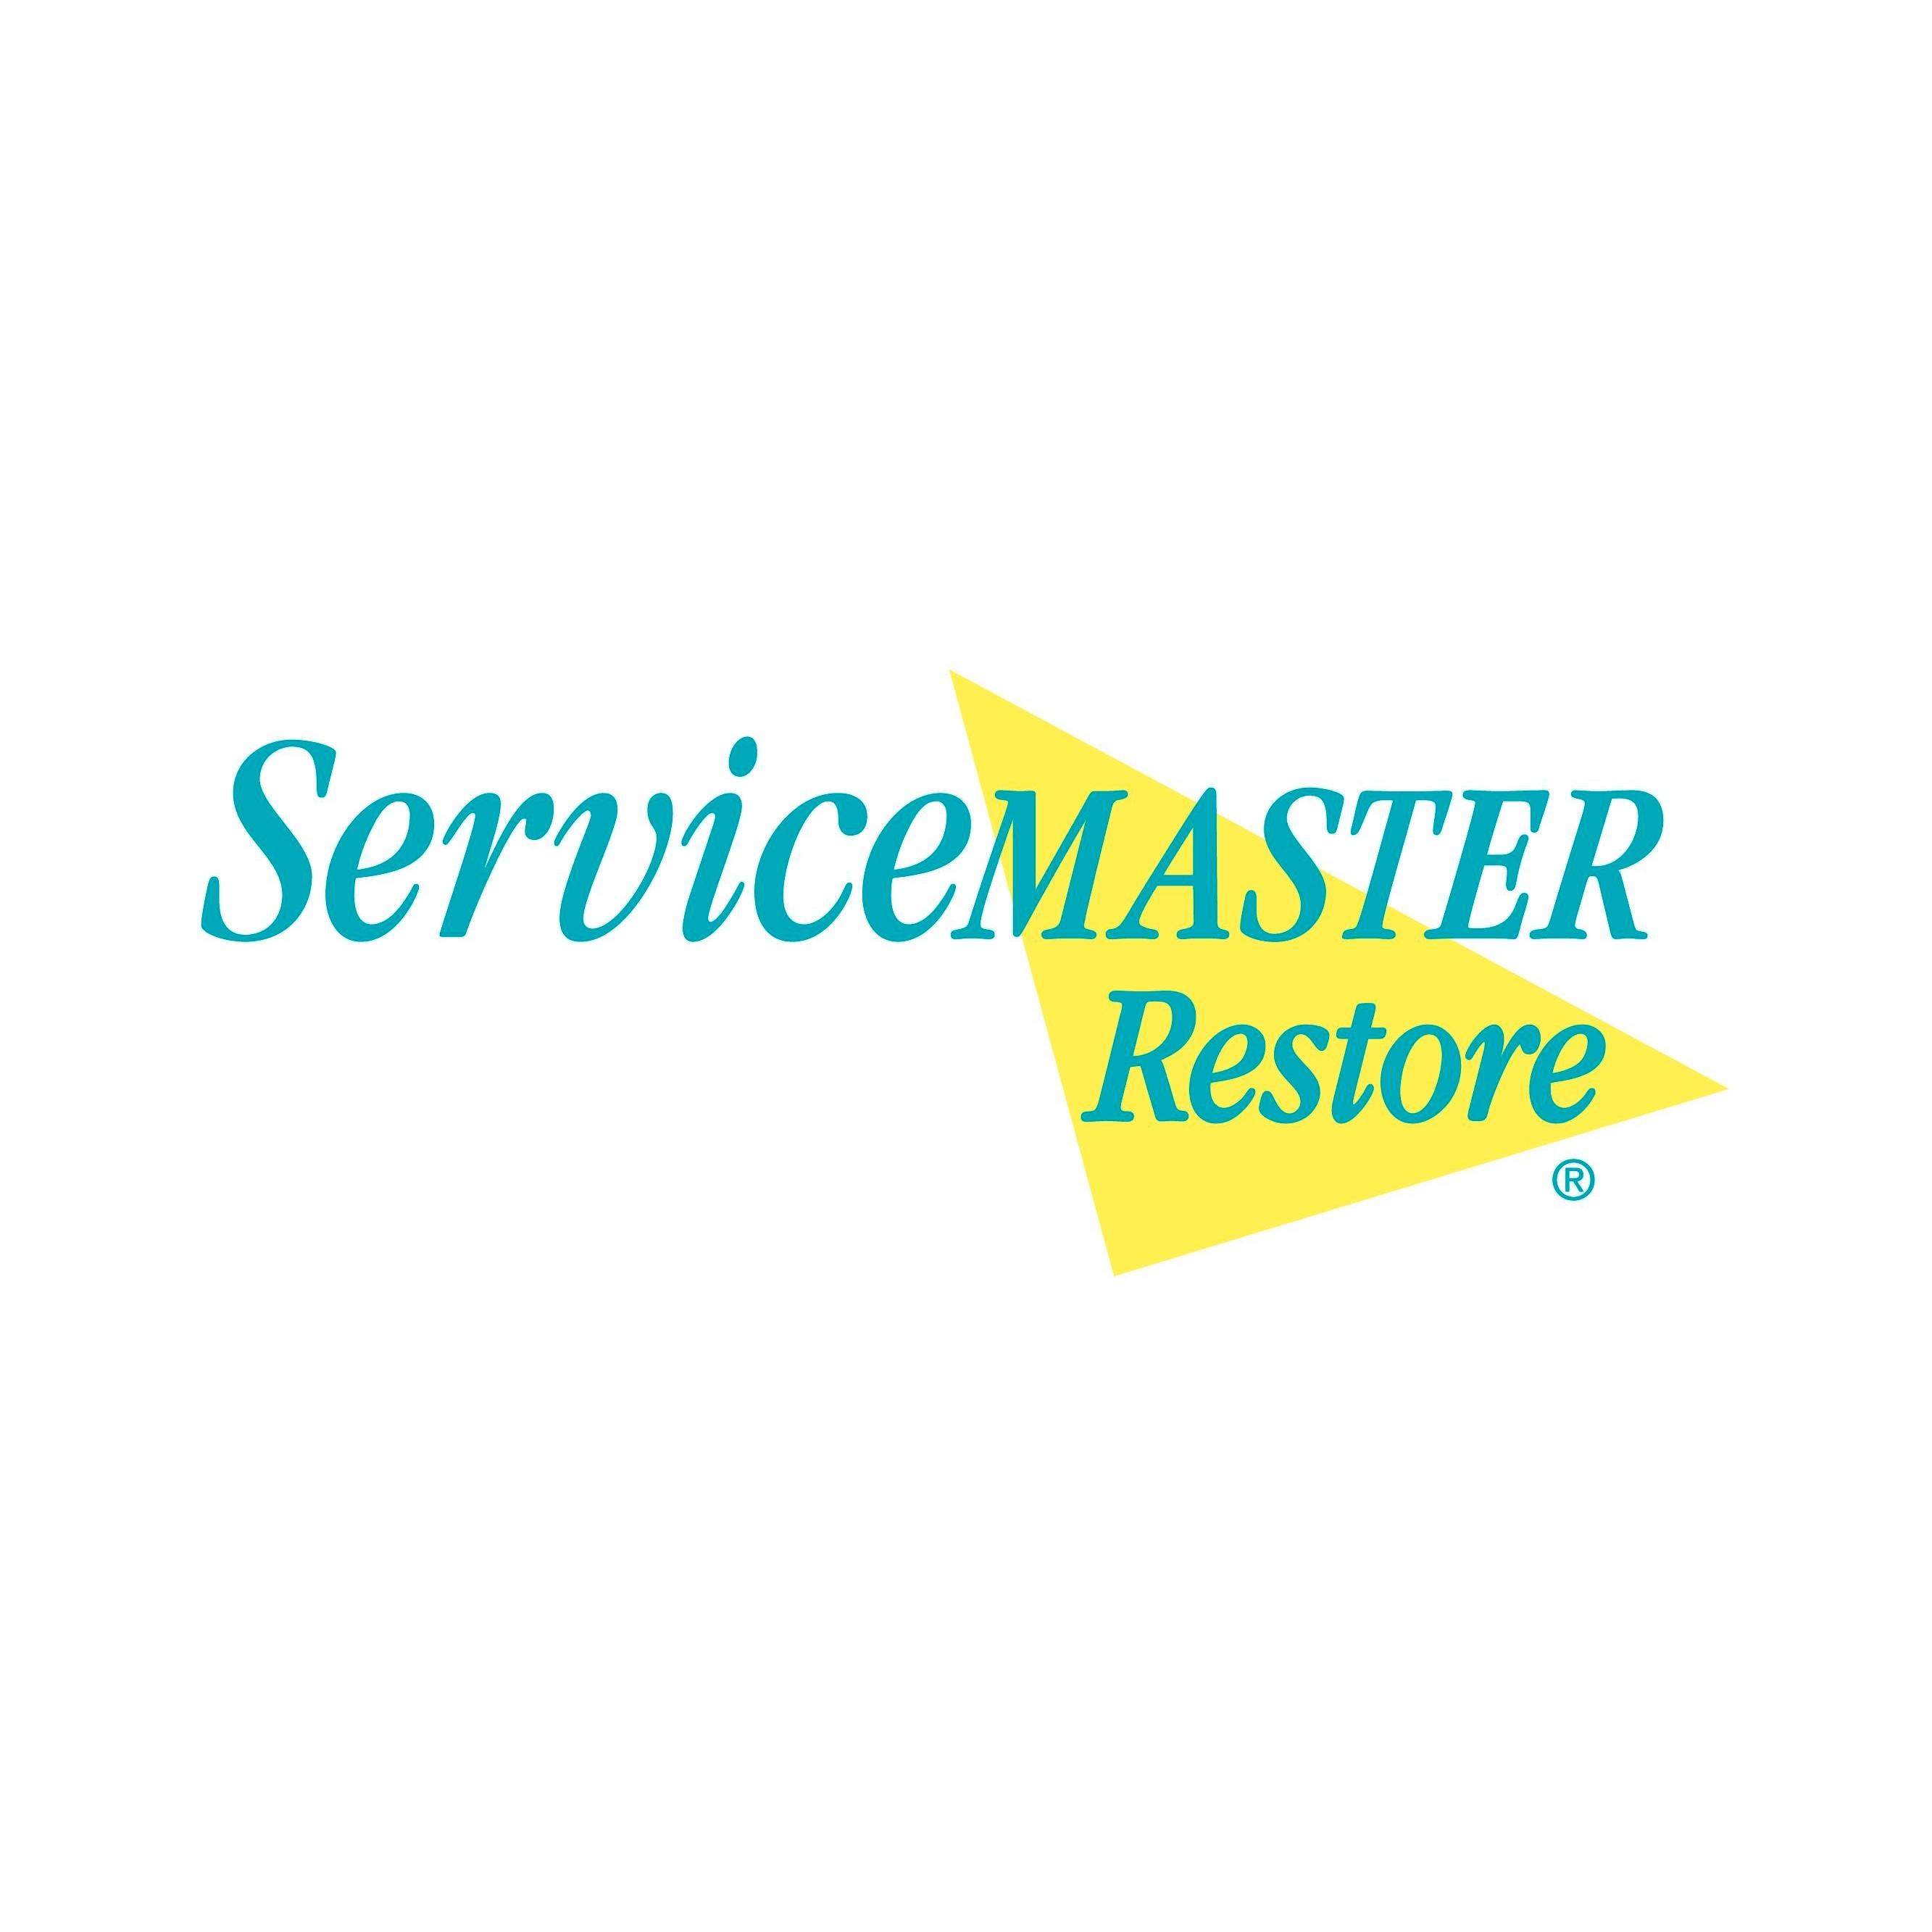 ServiceMaster DCS Mold Fire Water Damage Restoration Company Lemont IL image 8